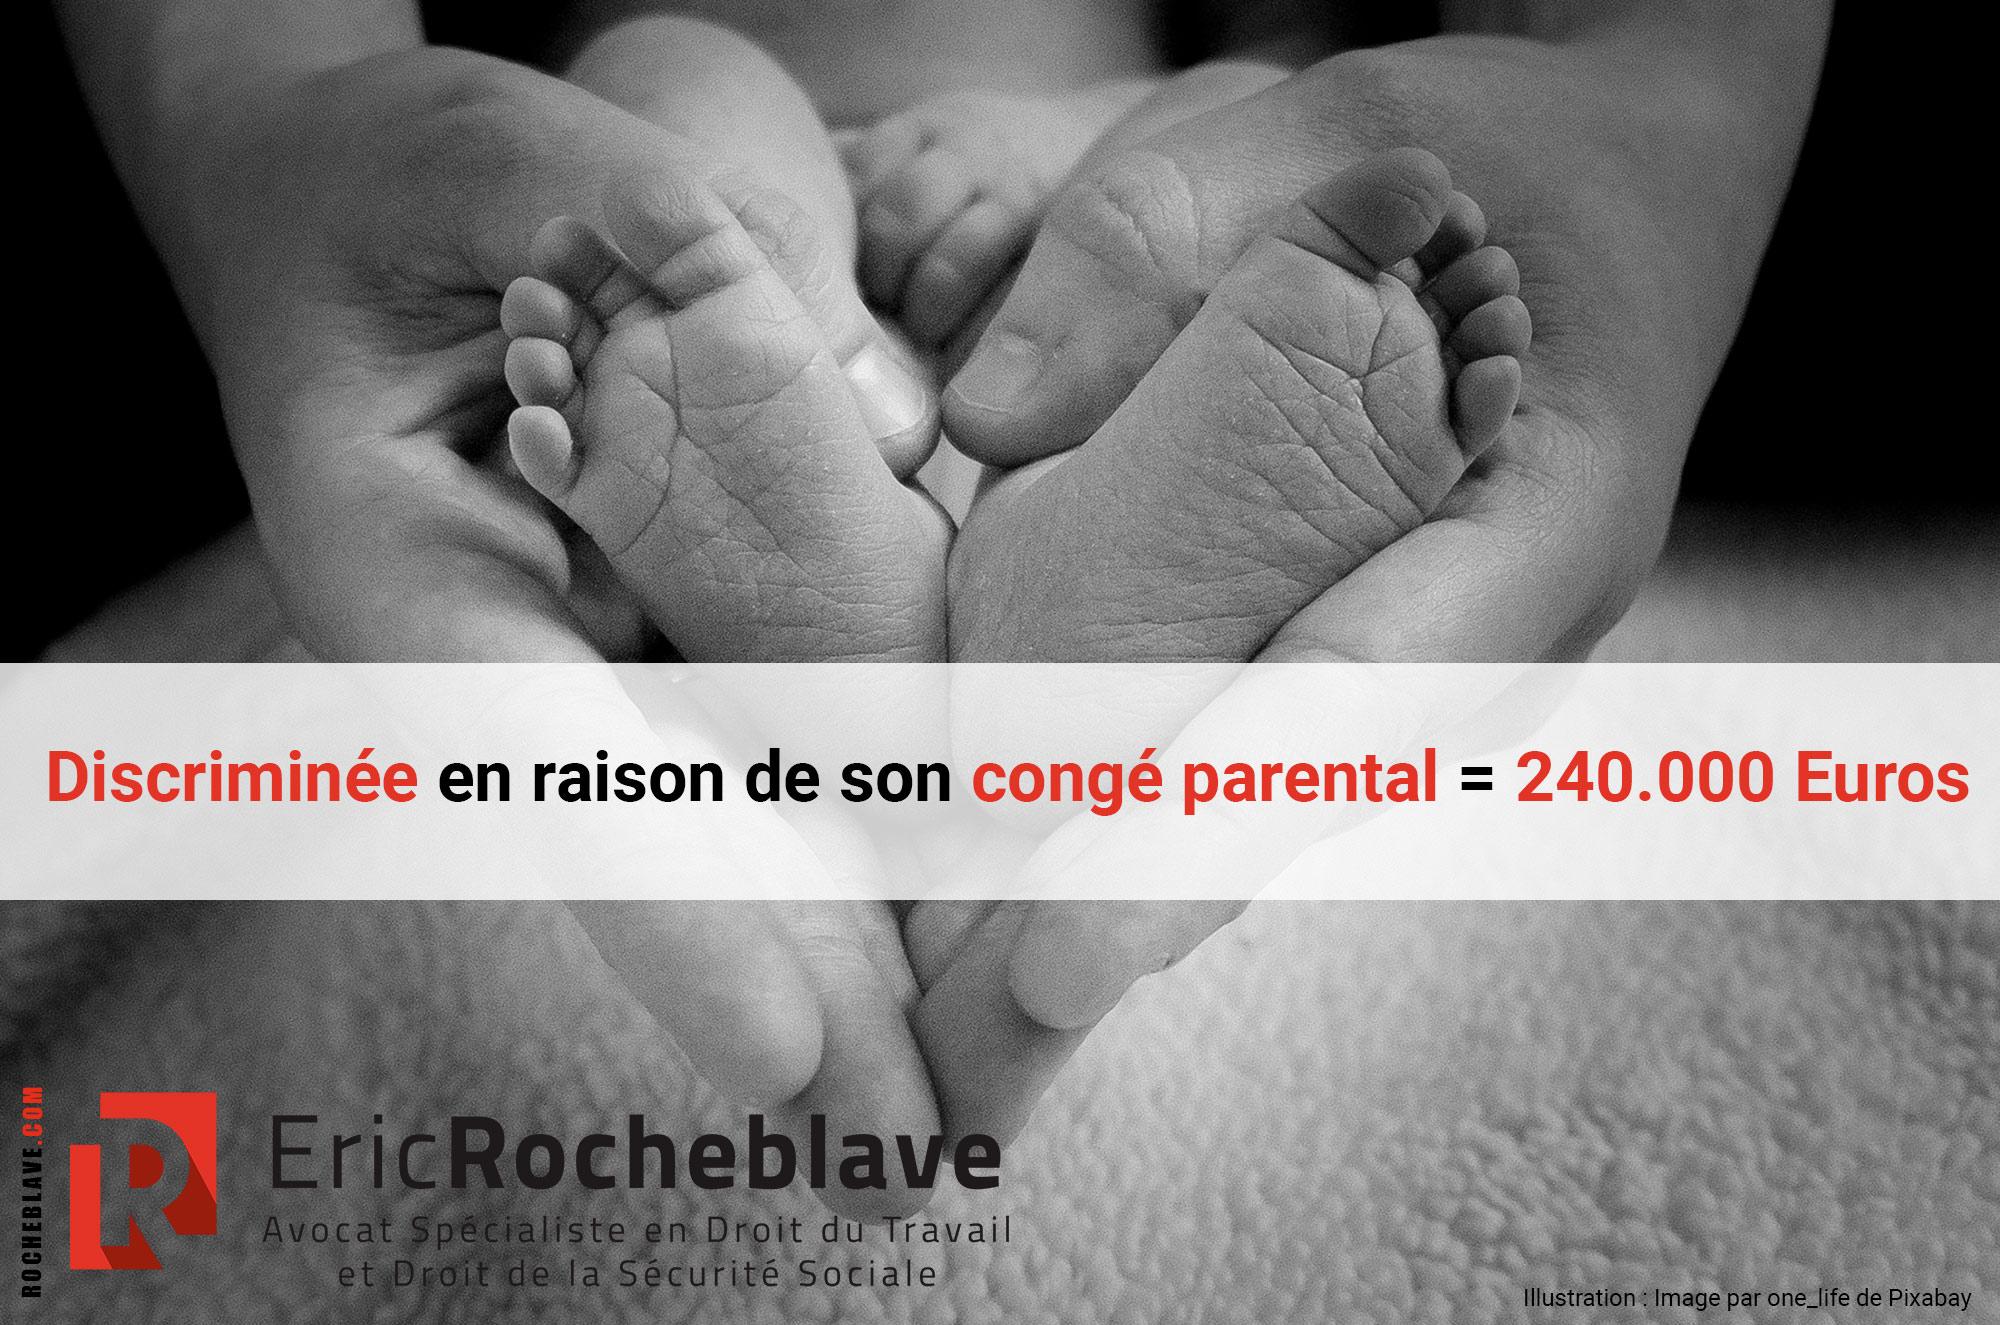 Discriminée en raison de son congé parental = 240.000 Euros